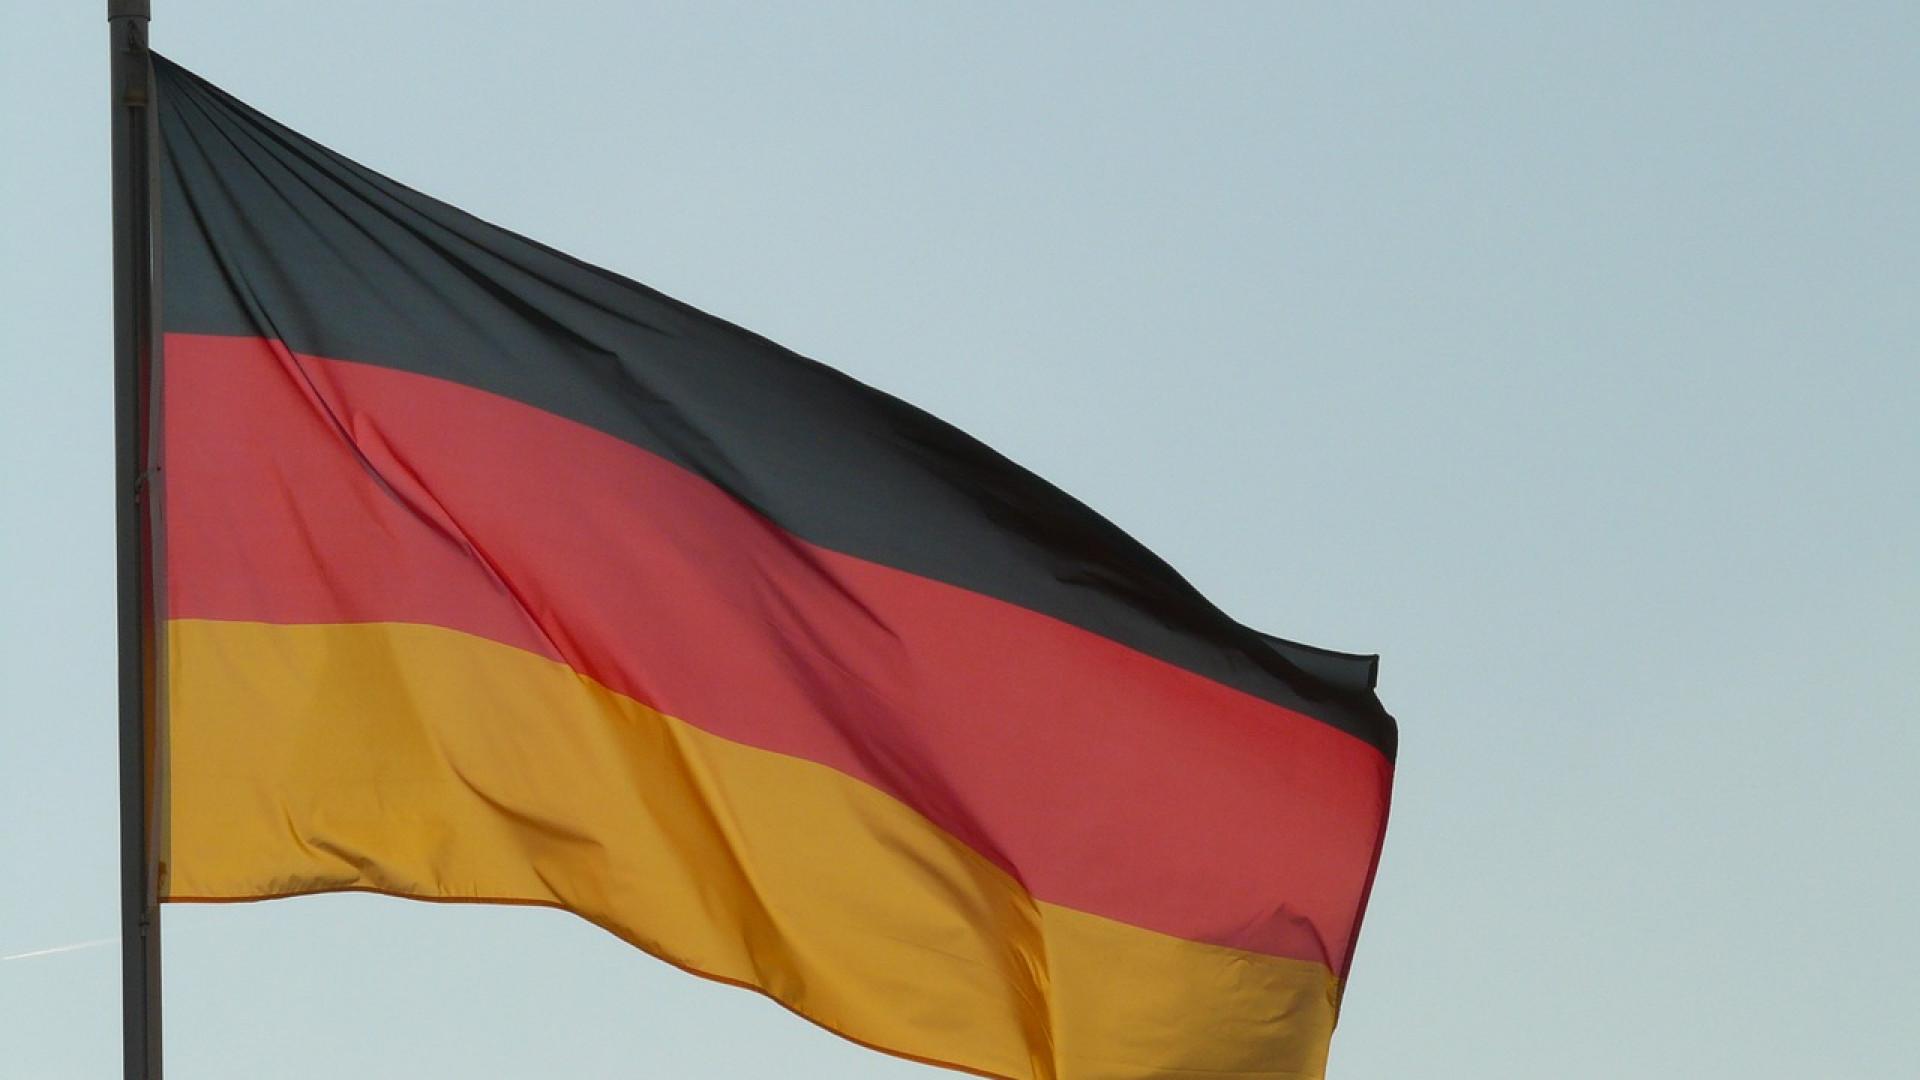 Berlin, capitale européenne où investir dans l'immobilier